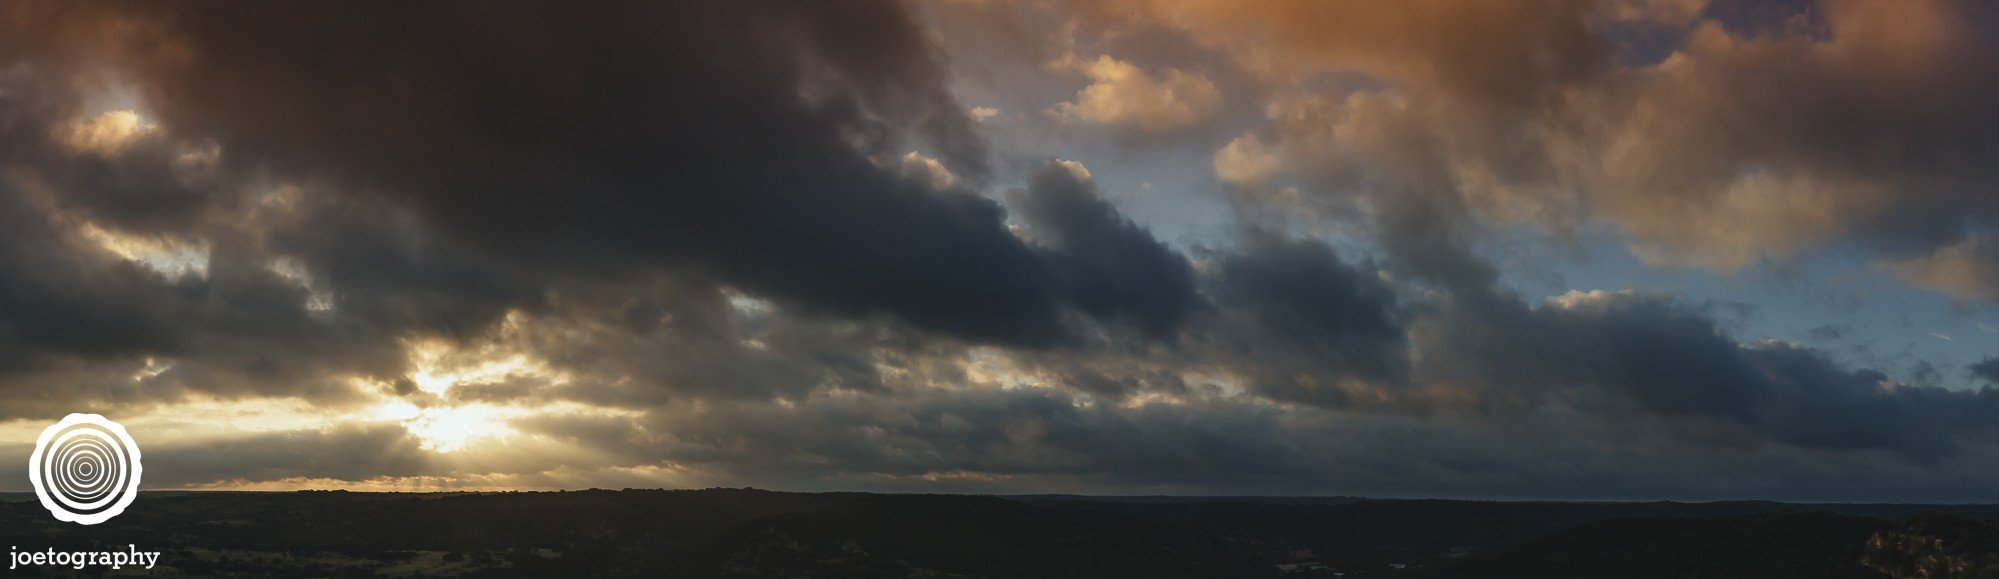 laity-lodge-san-antonio-texas-landscape-photographer-indianapolis-30